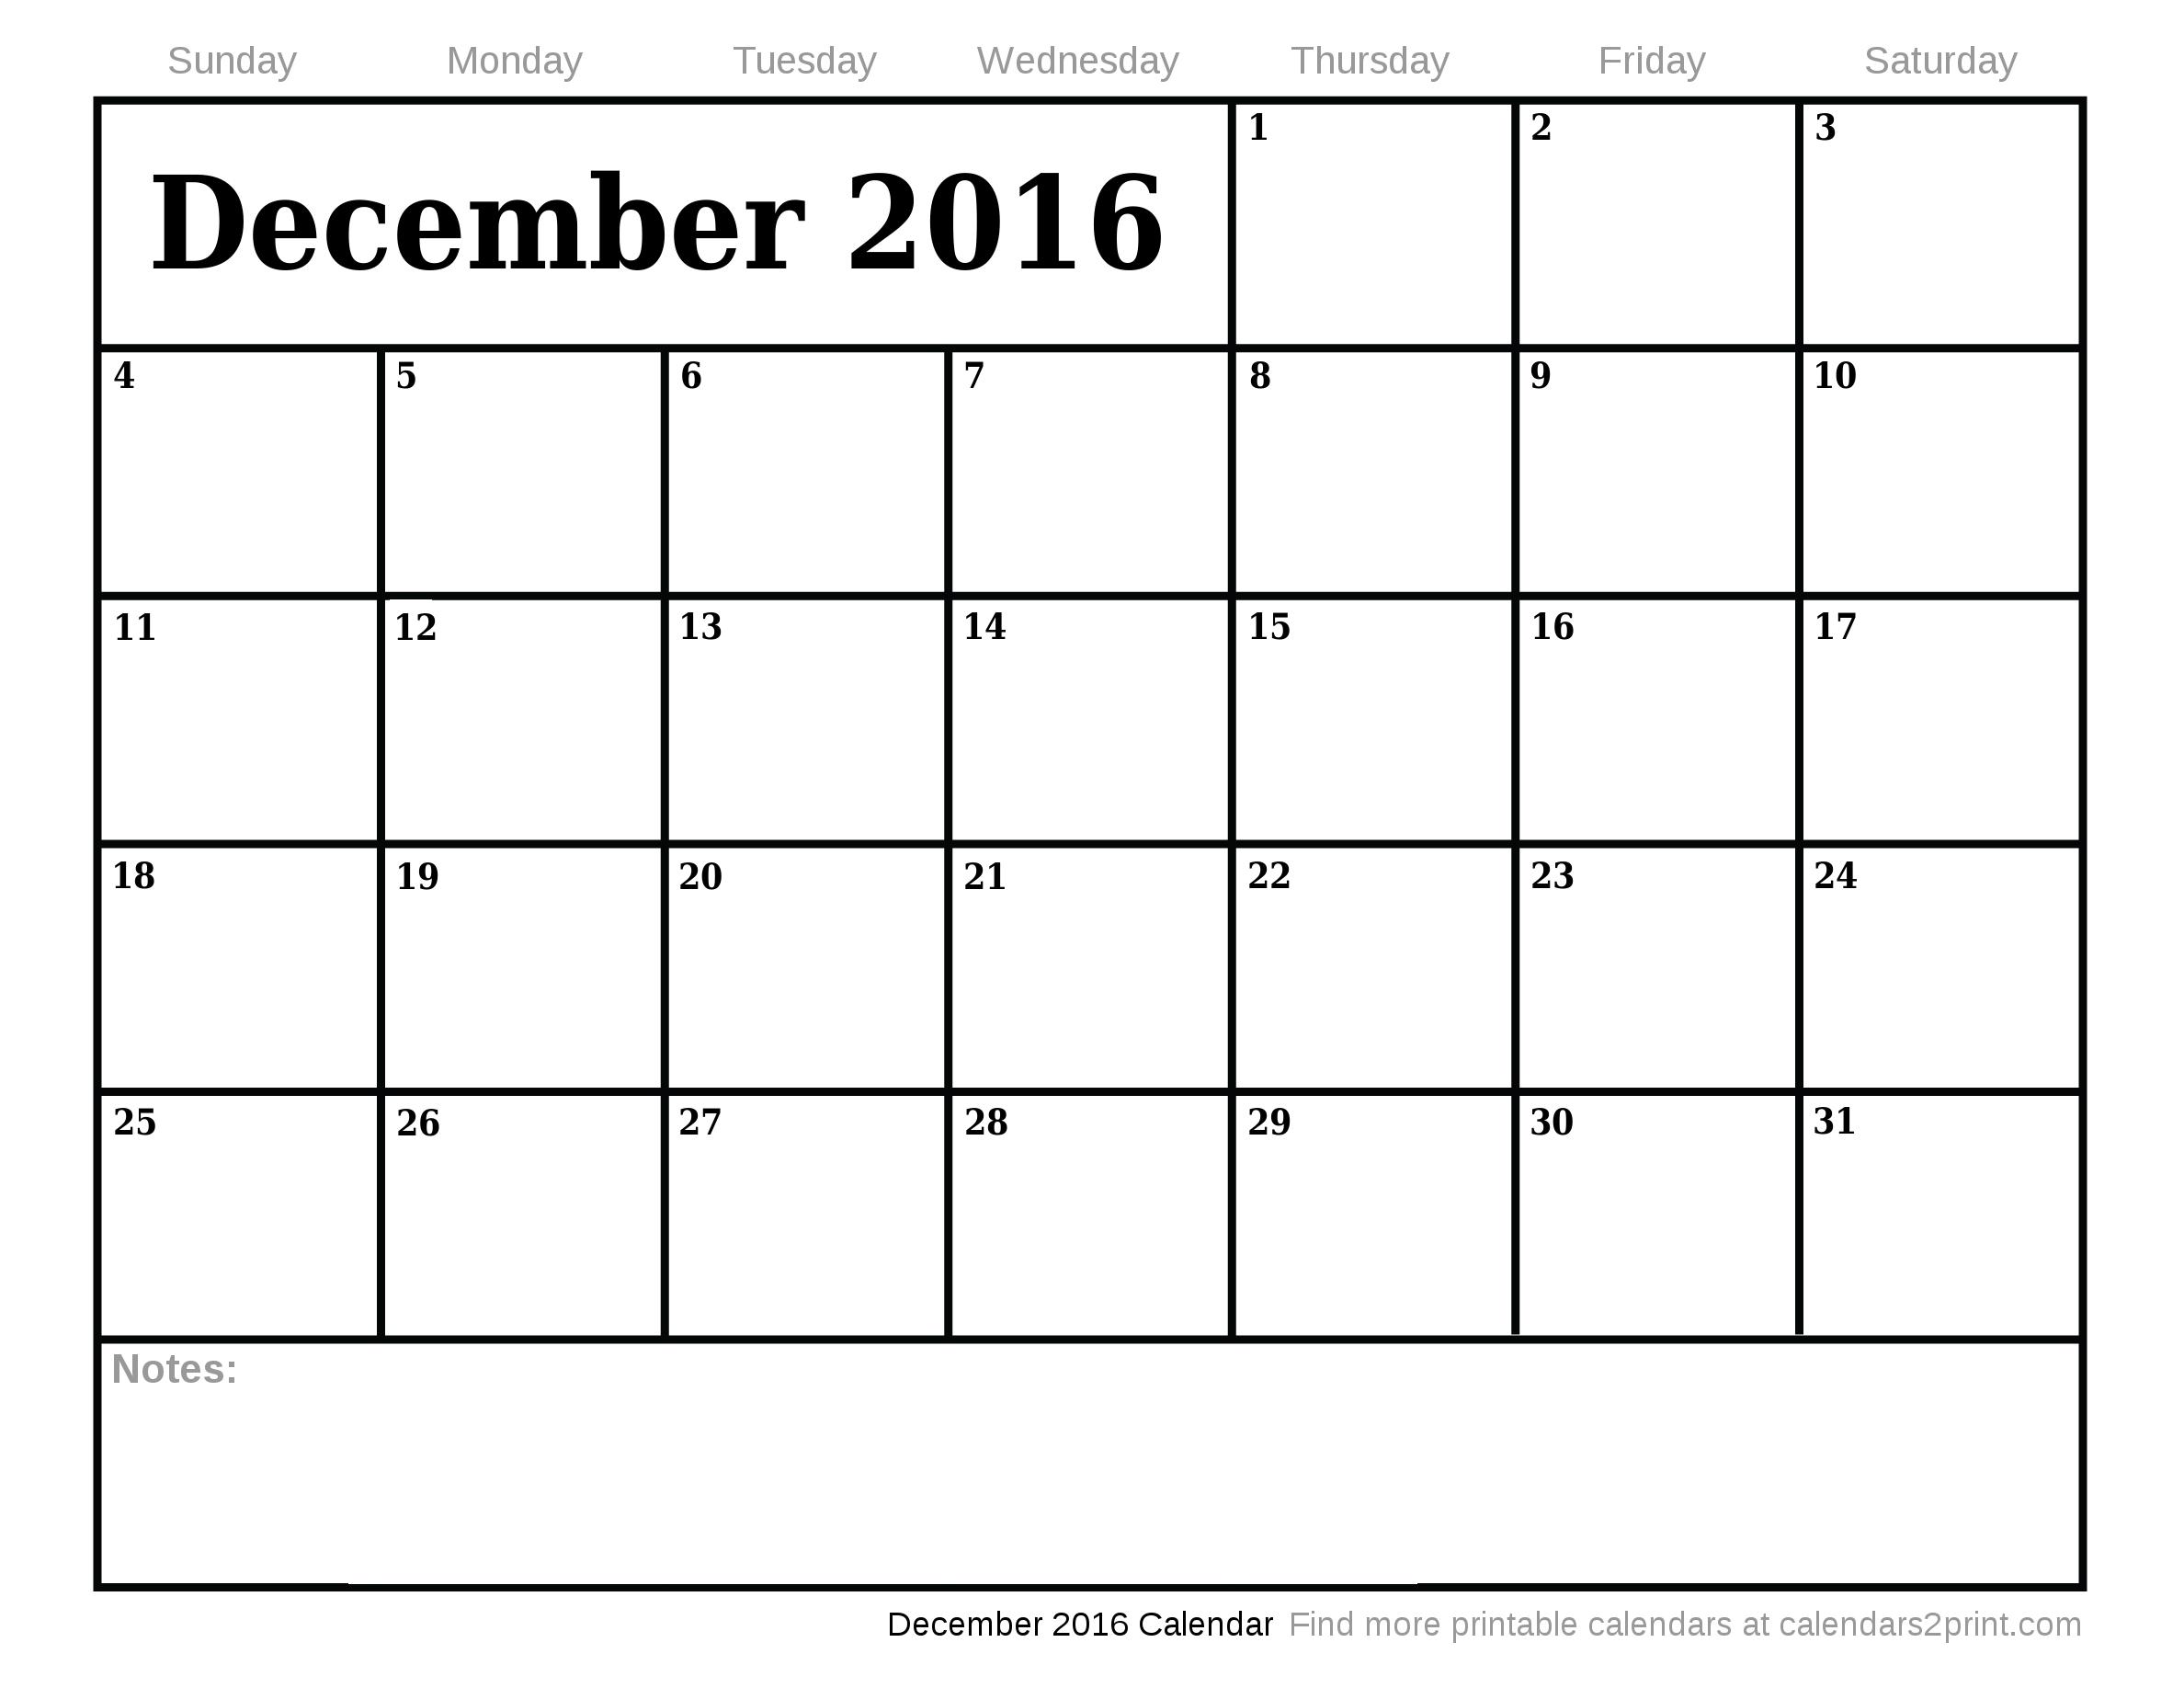 December calendar 2016 library December calendar 2016 - ClipartFest library